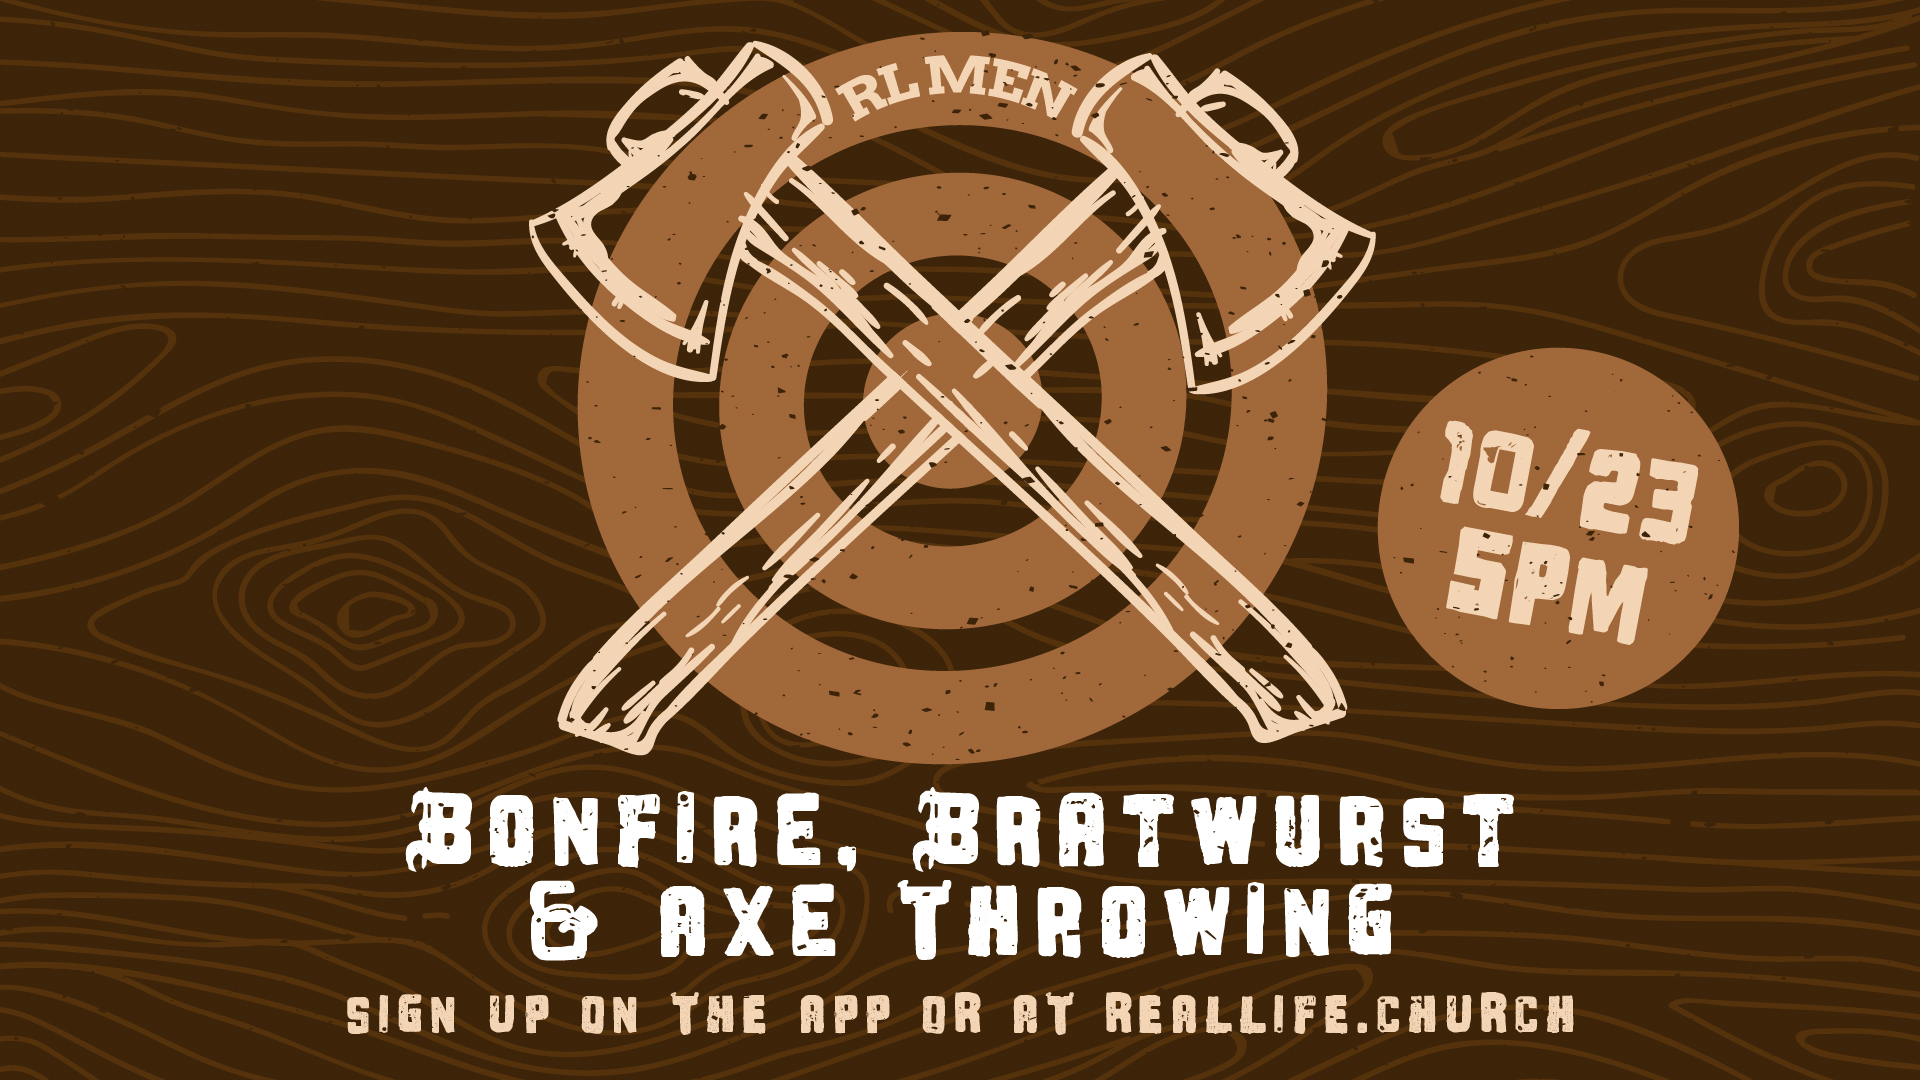 Bonfire, Bratwurst and Axe Throwing